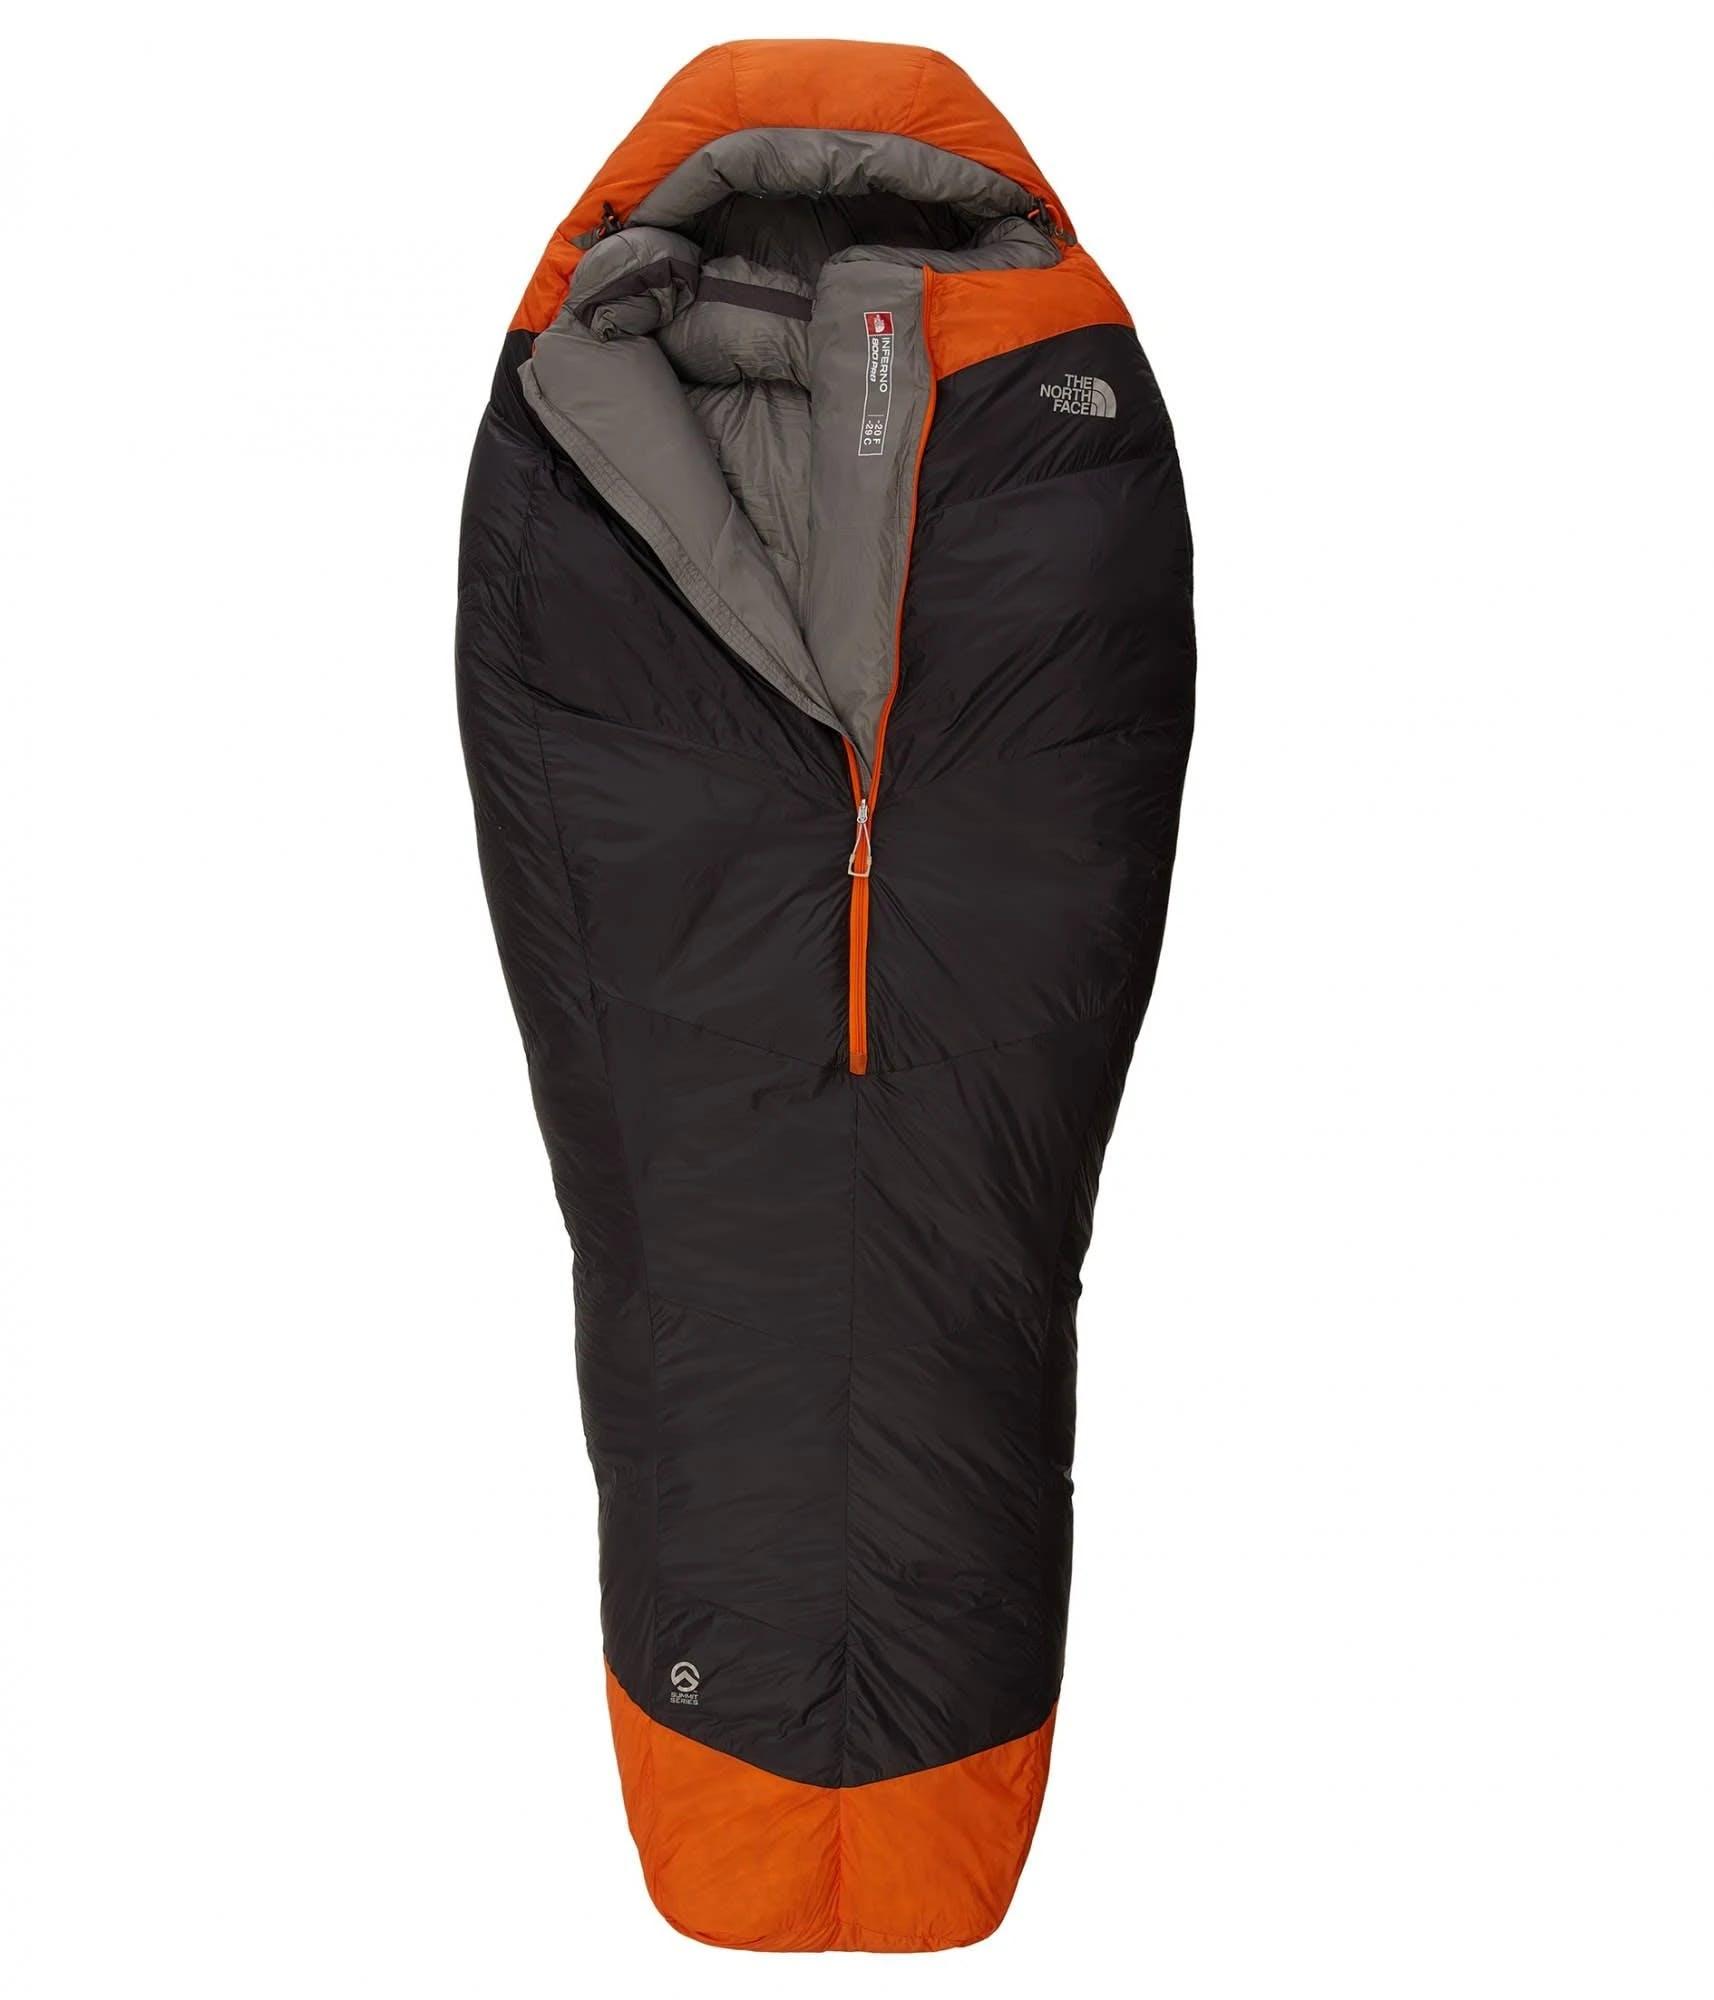 The North Face Inferno -20f/-29c Sleeping Bag Long Asphalt Grey/